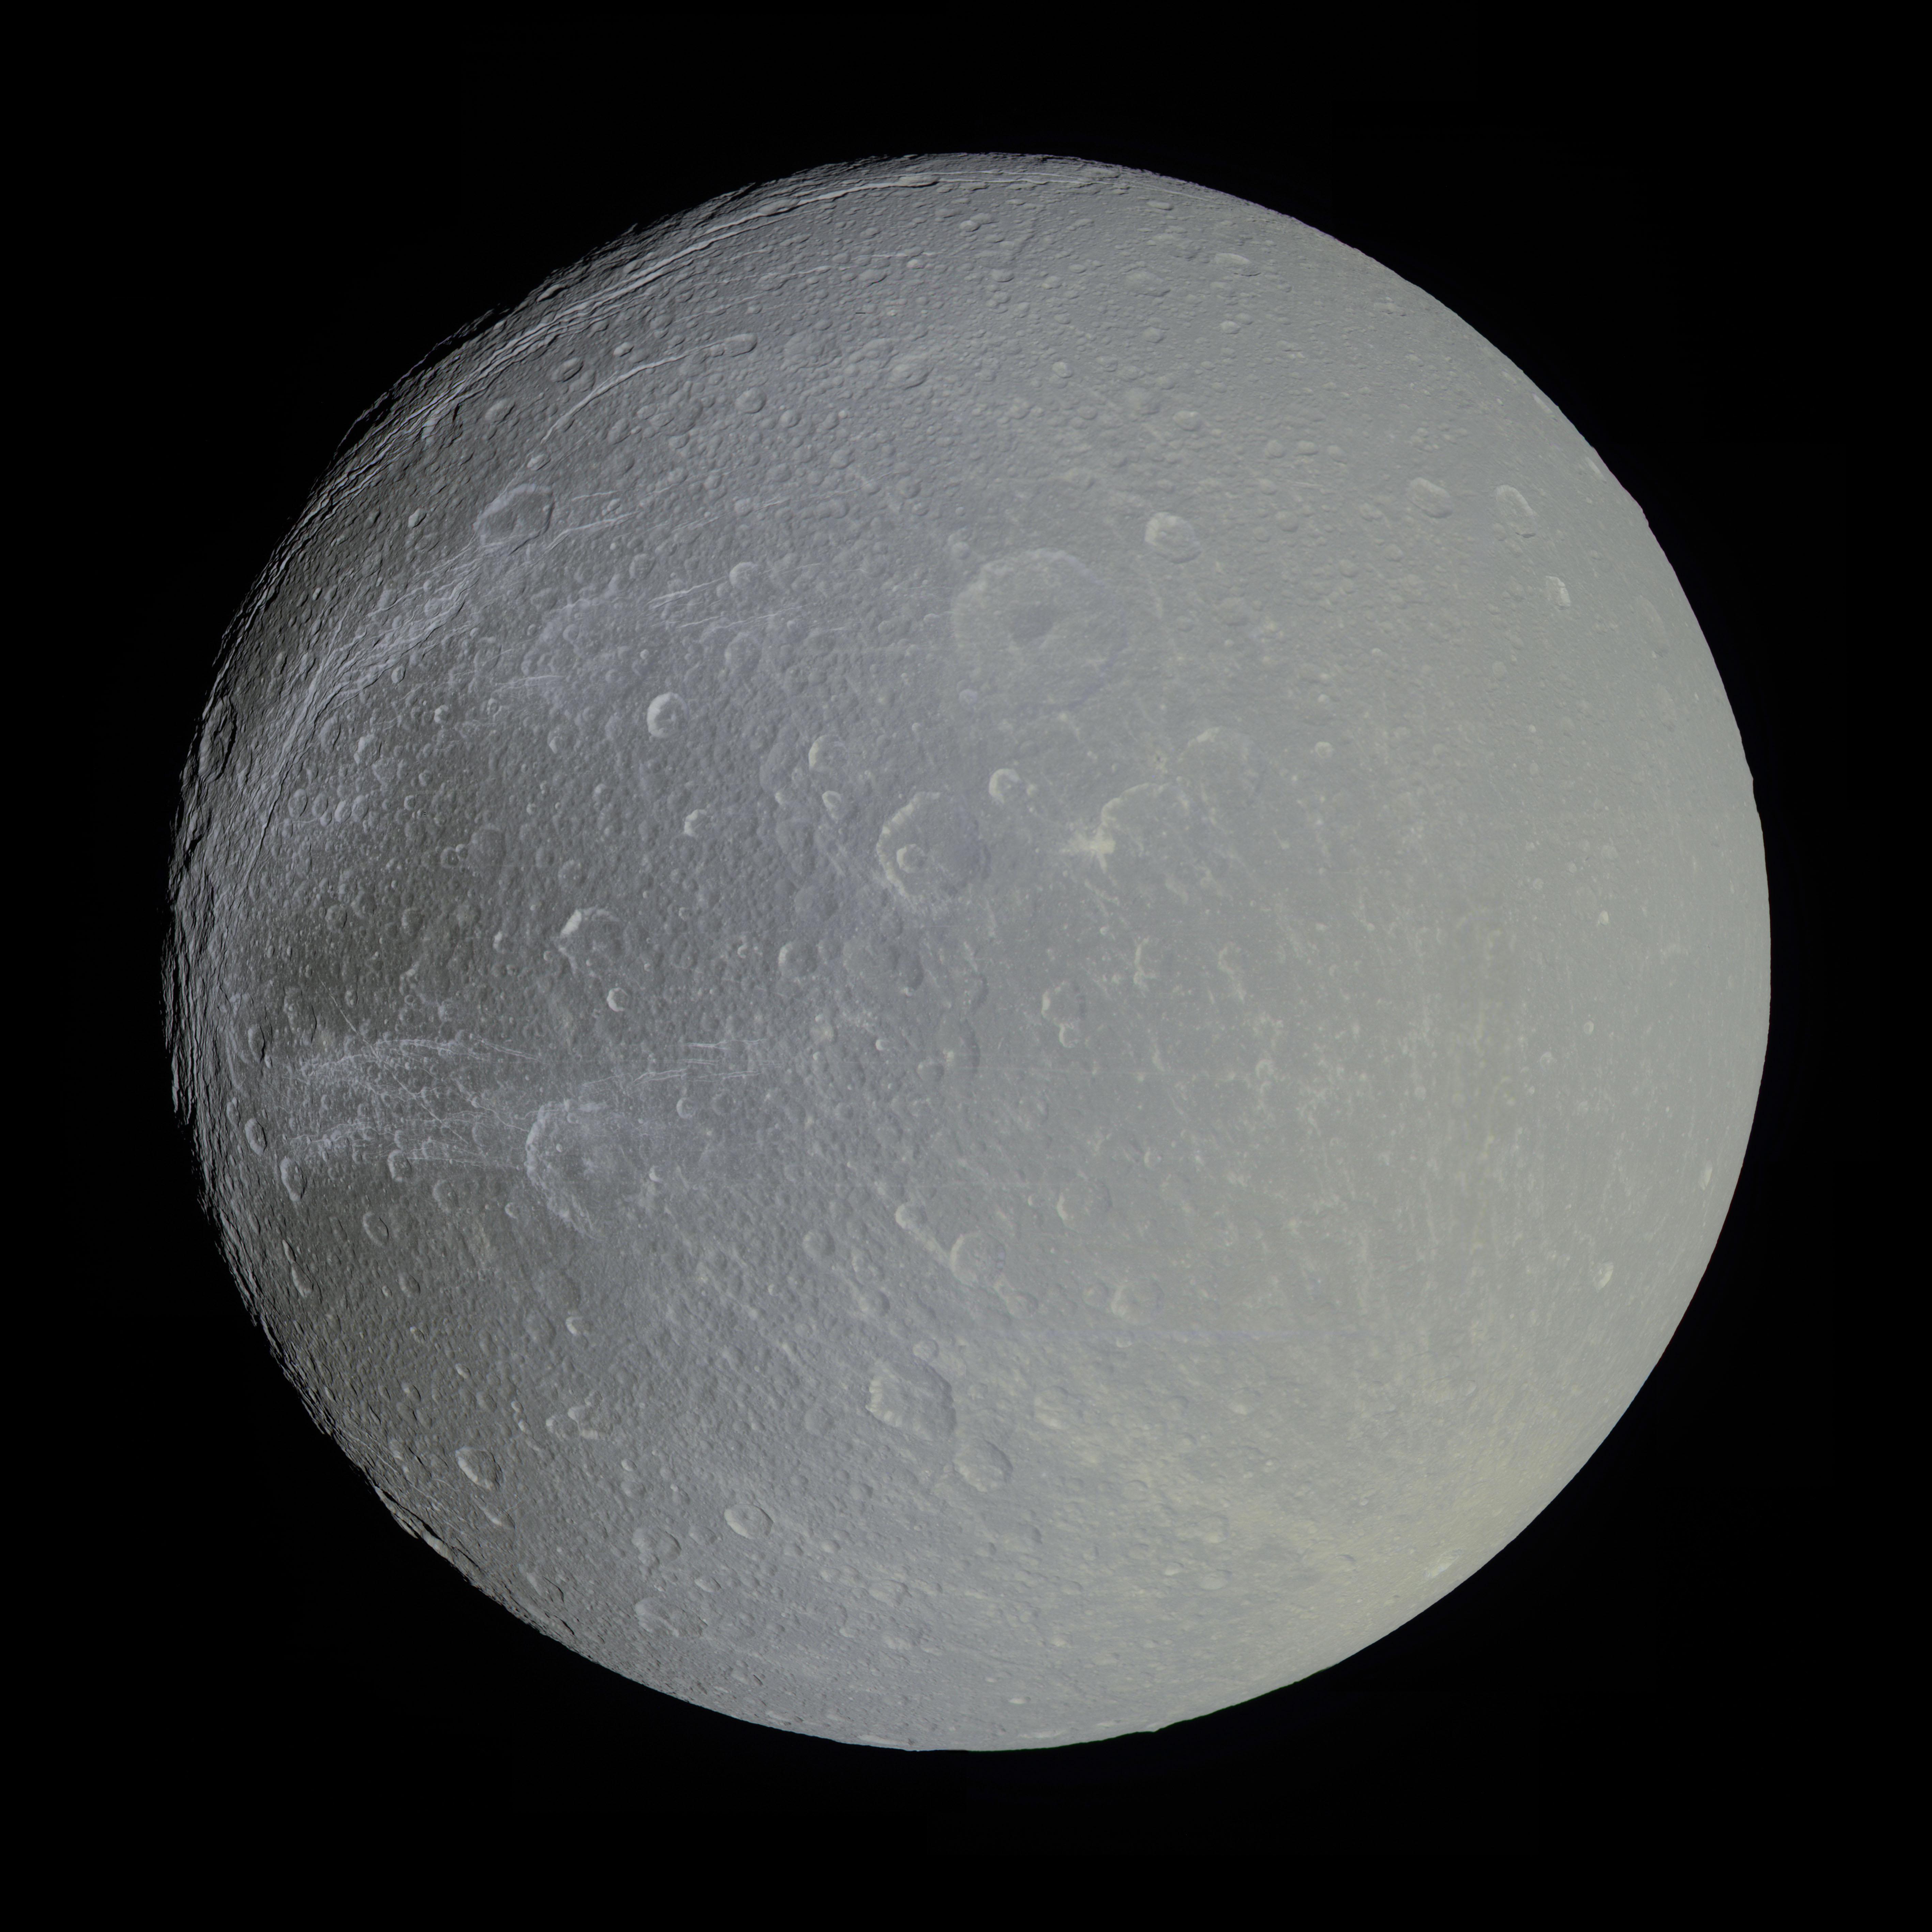 APOD: 2012 November 5 - Saturn's Moon Dione in Slight Color